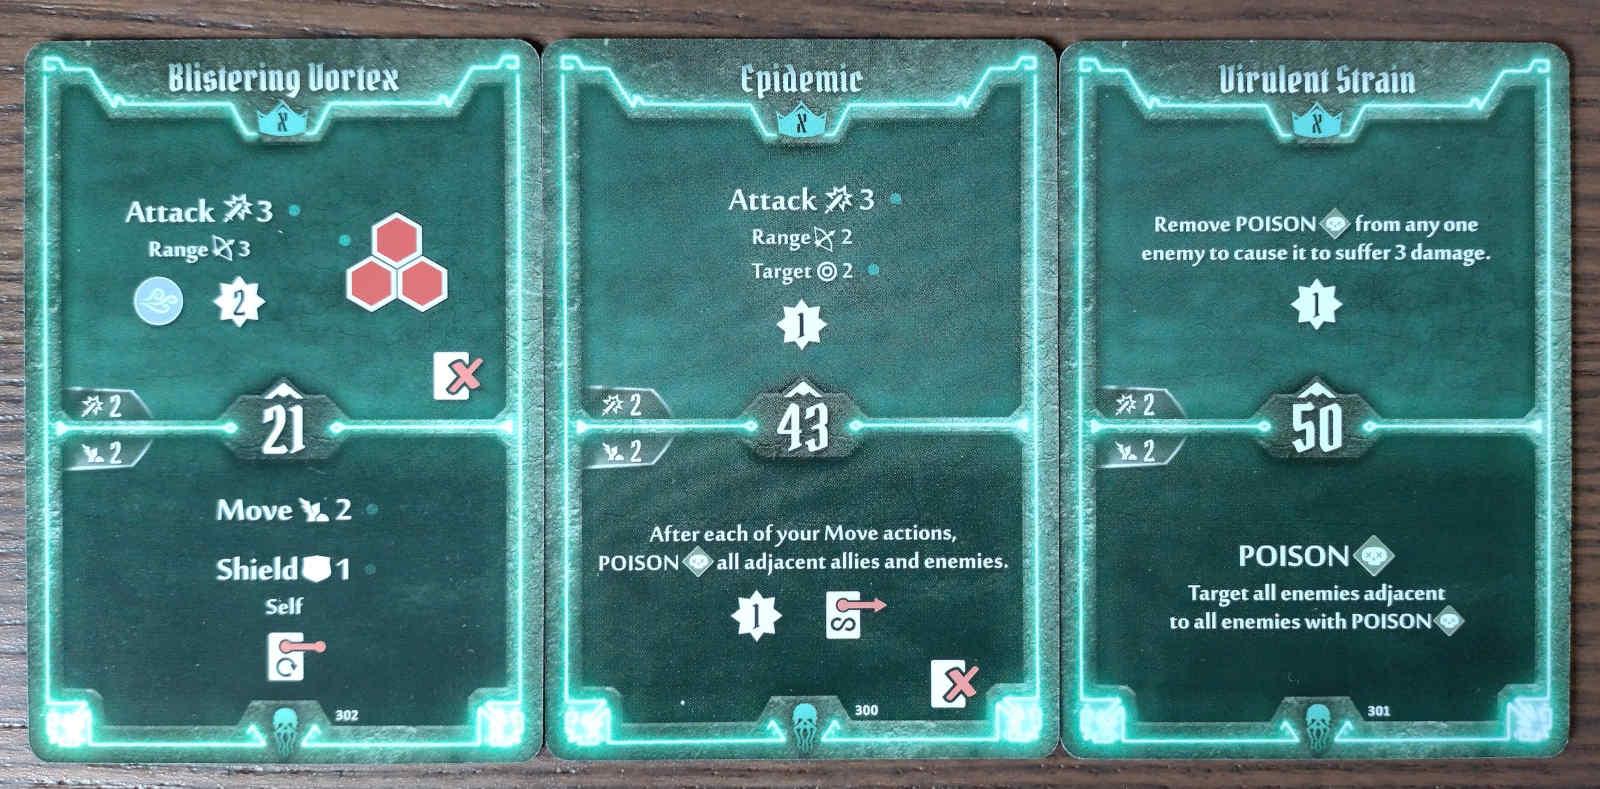 Plagueherald level X cards - Blistering Vortex, Epidemic, Virulent Strain